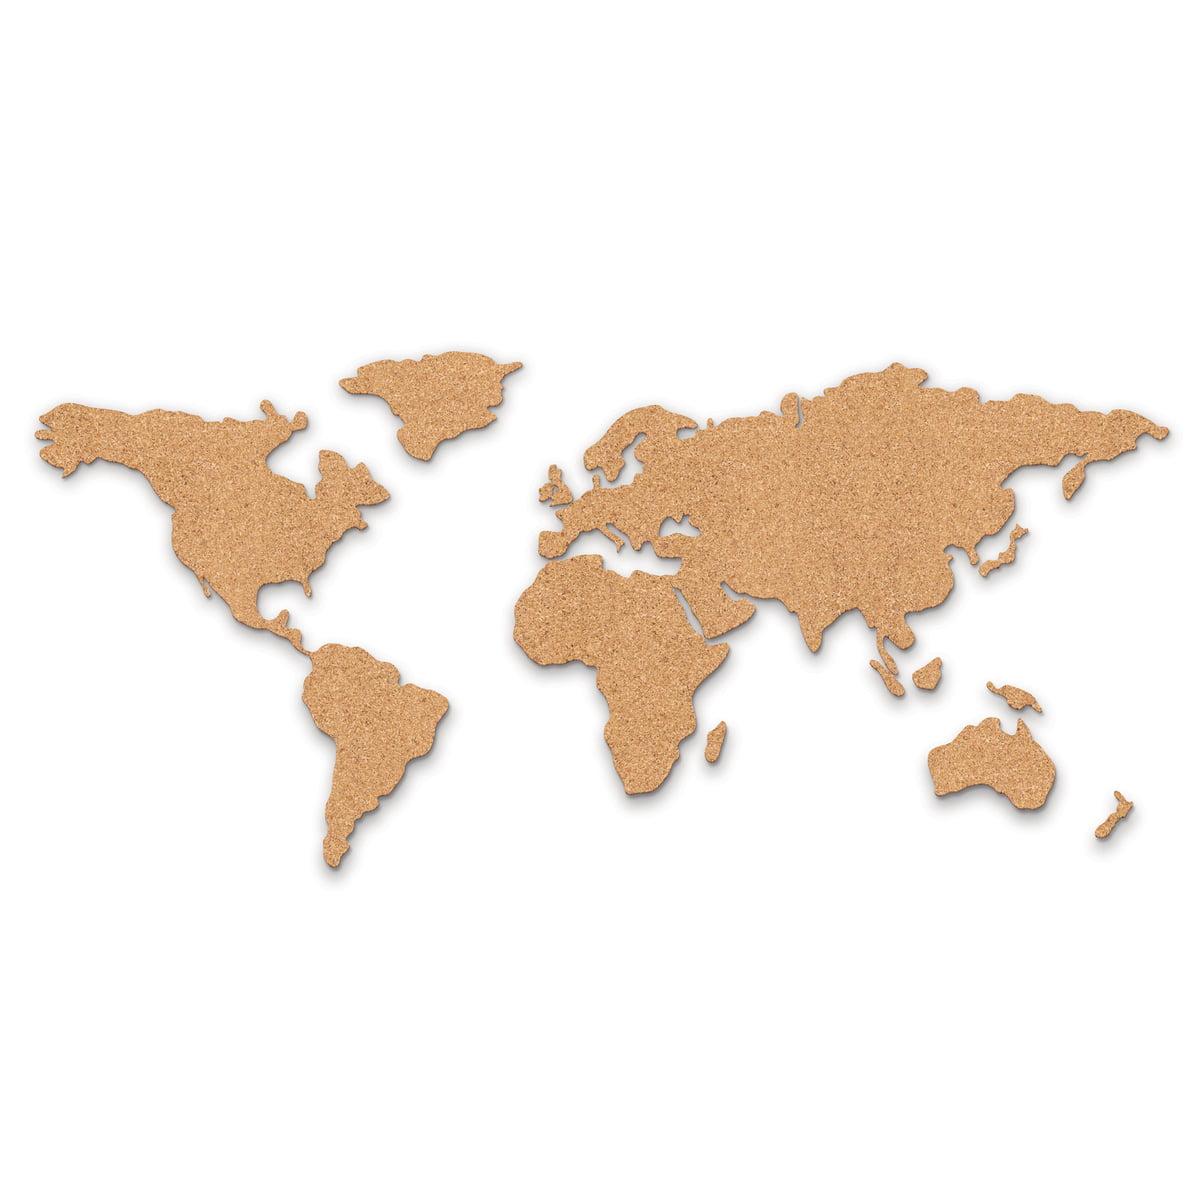 ... Corkboard Map Pinnwand